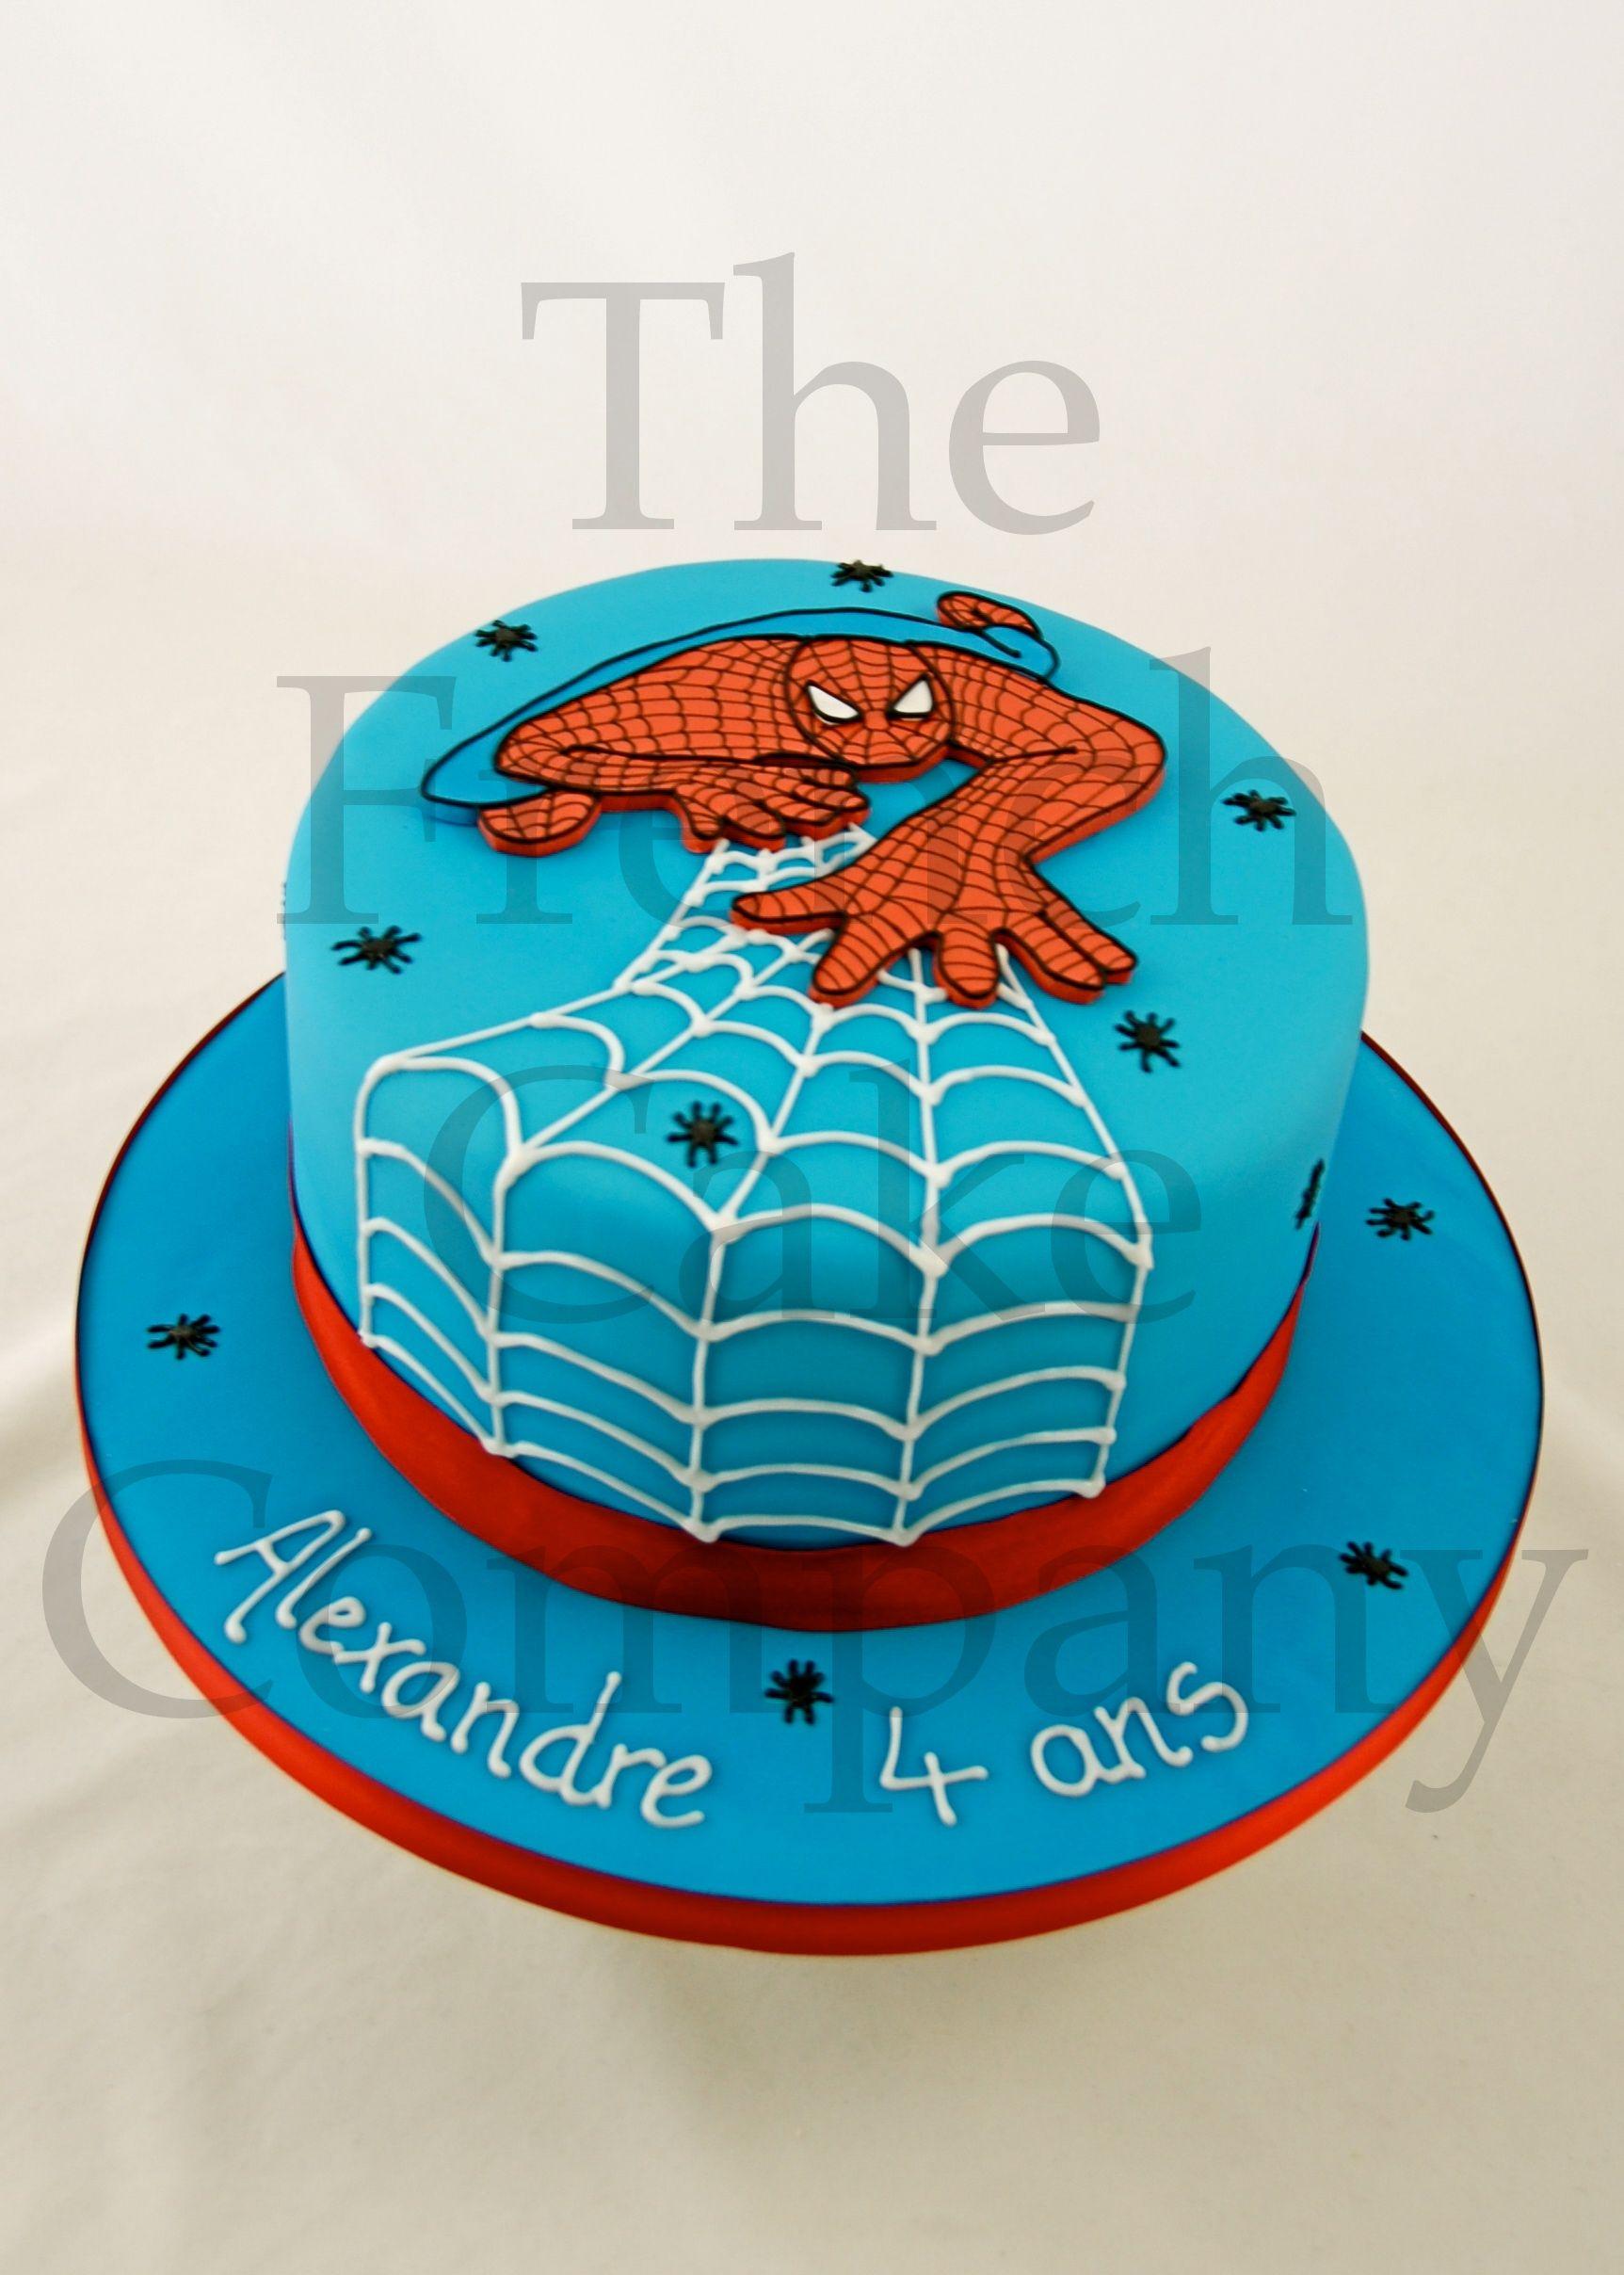 cake for boys spiderman gateau d 39 anniversaire pour enfants garcon spiderman verjaardagstaart. Black Bedroom Furniture Sets. Home Design Ideas